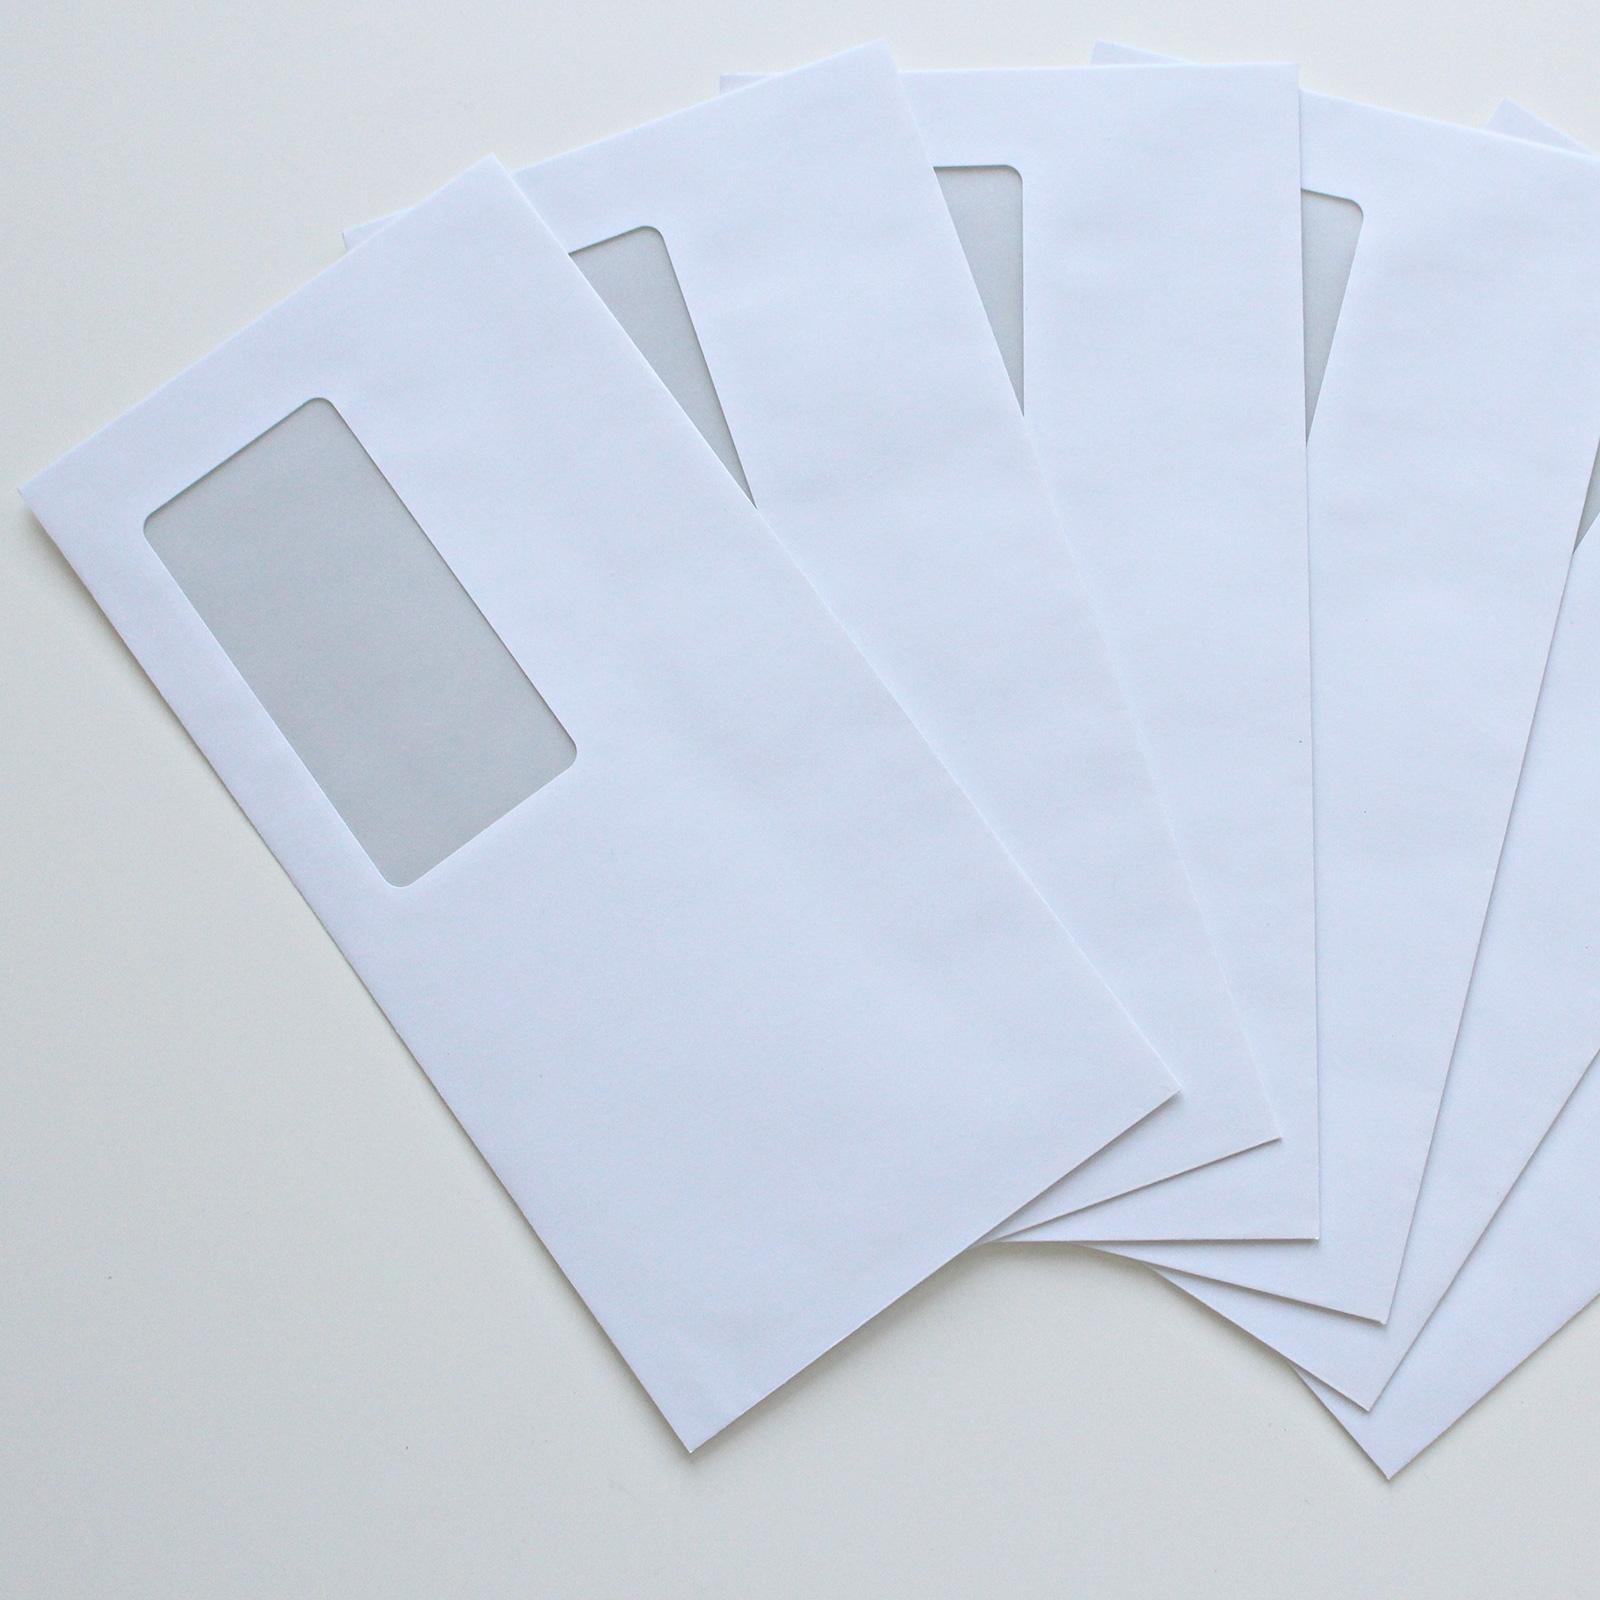 Base Datos Códigos Postales